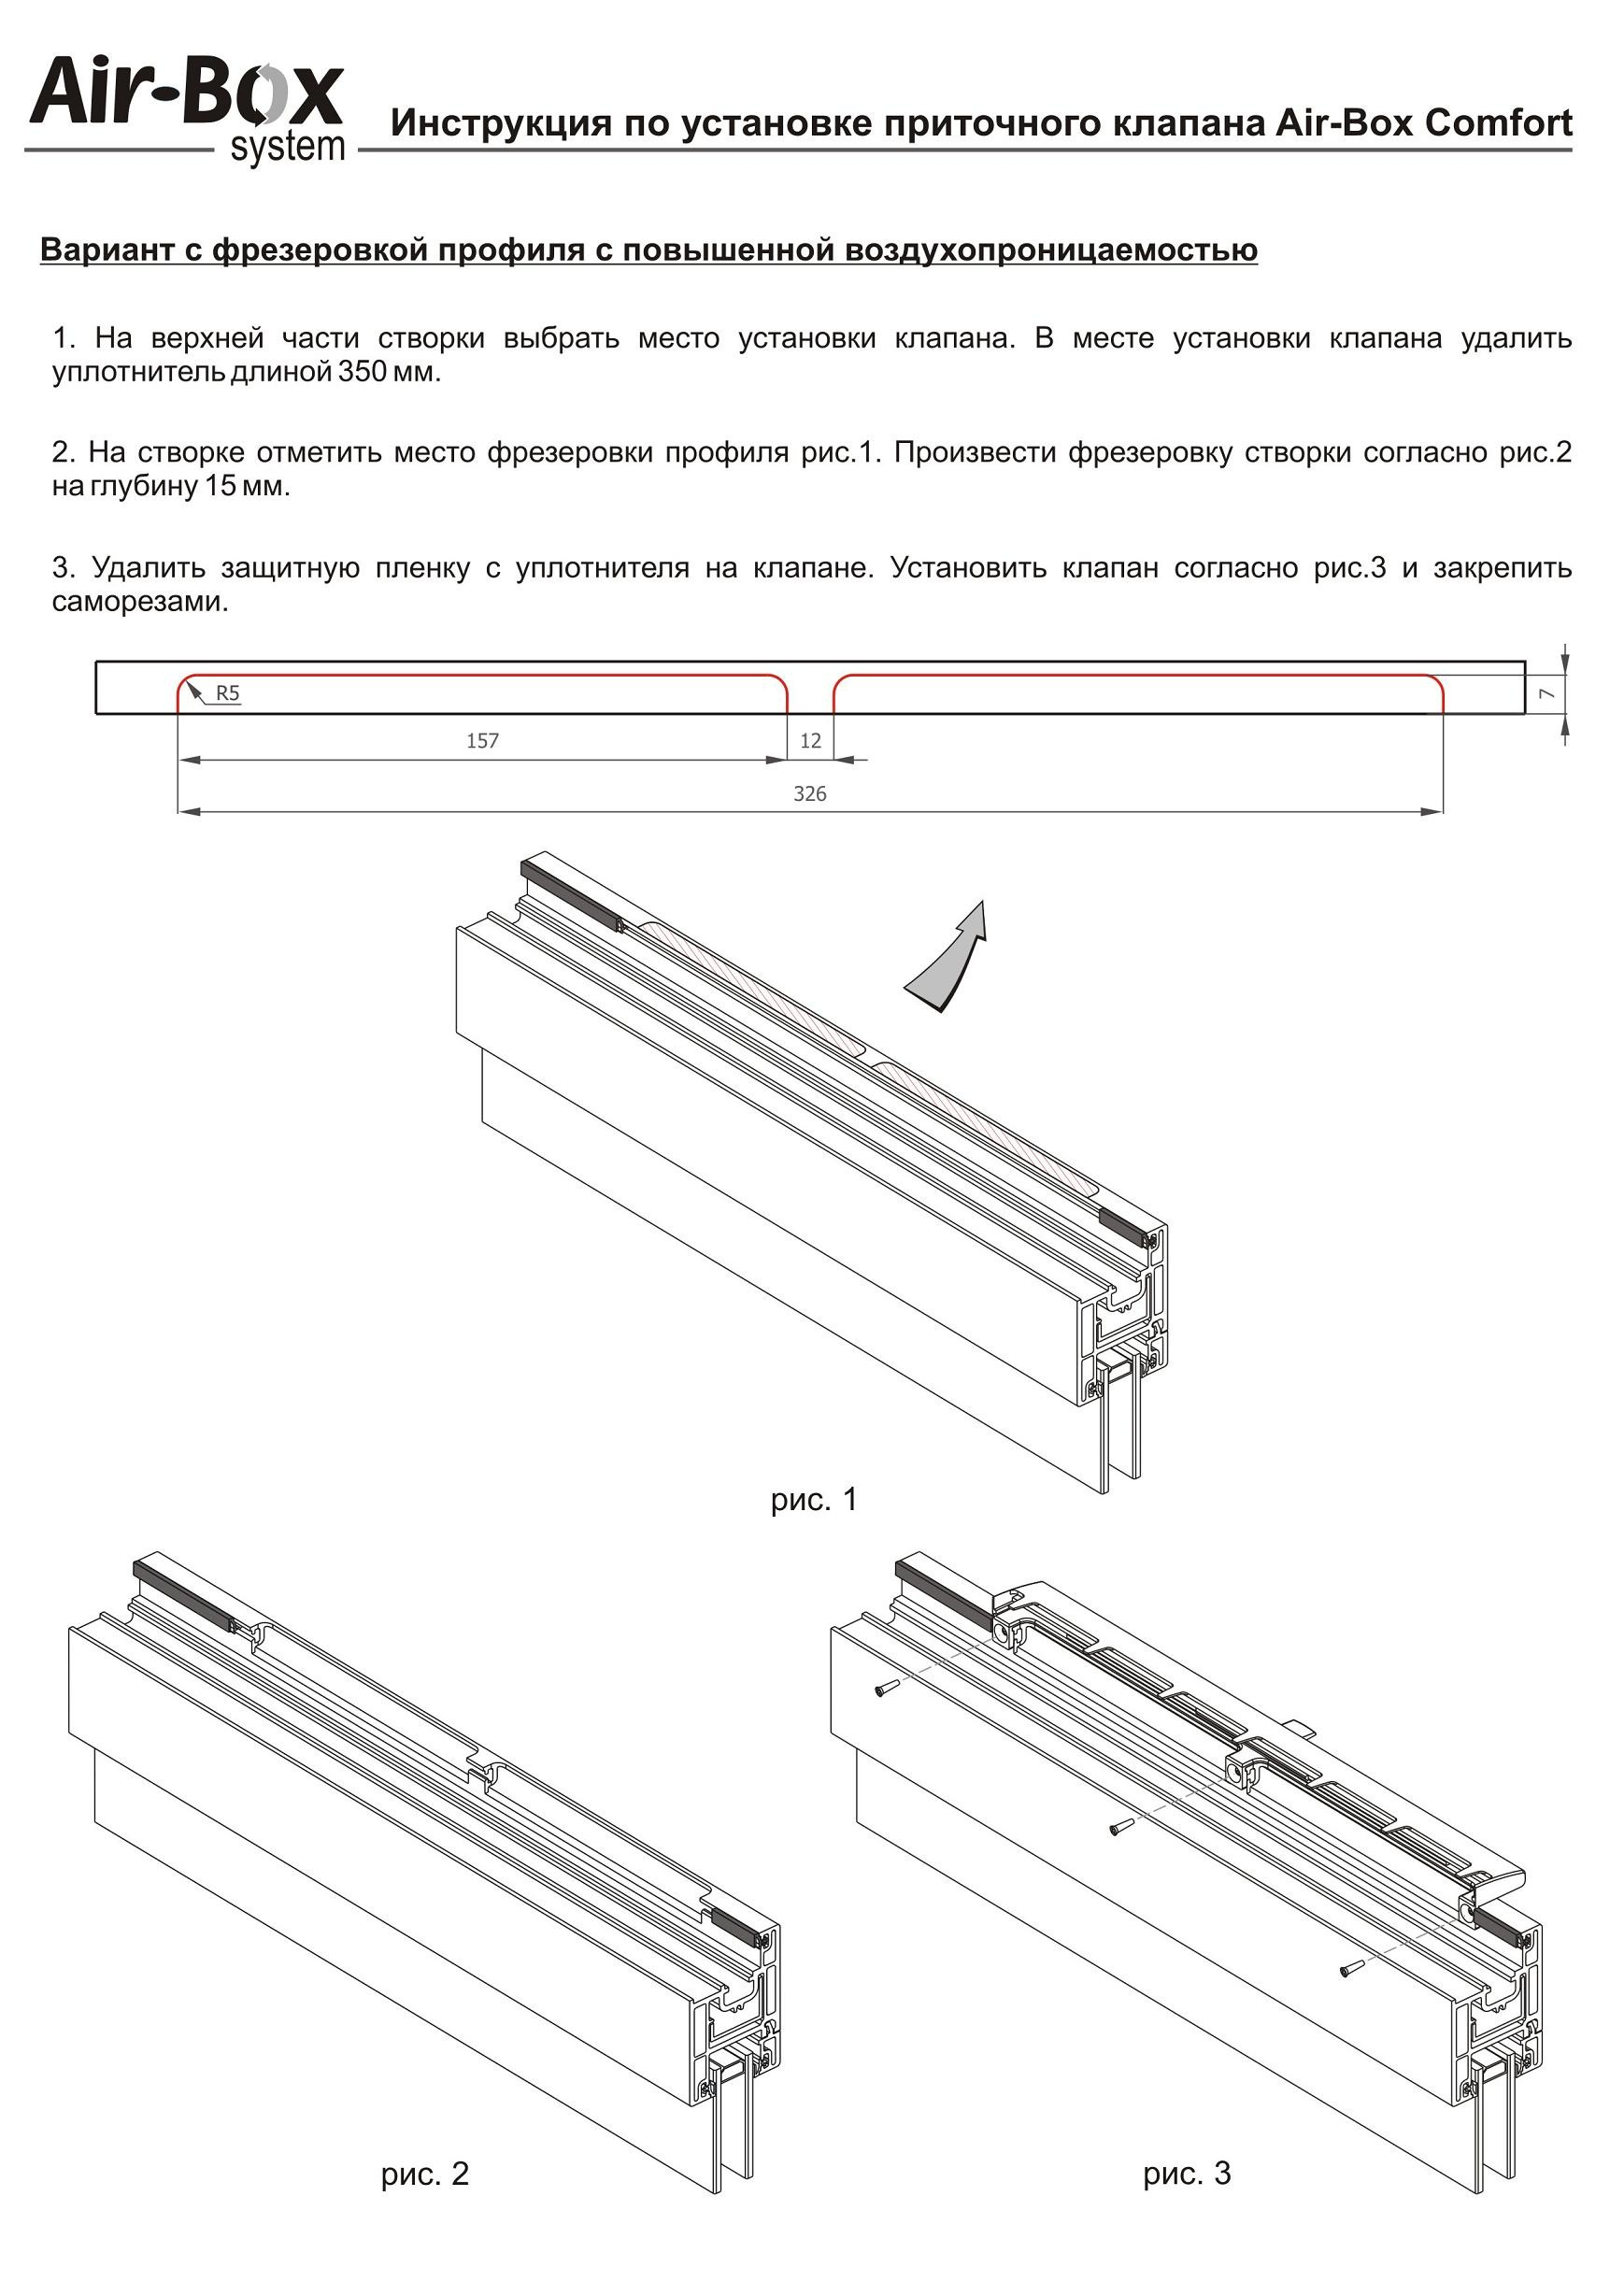 Air box comfort инструкция